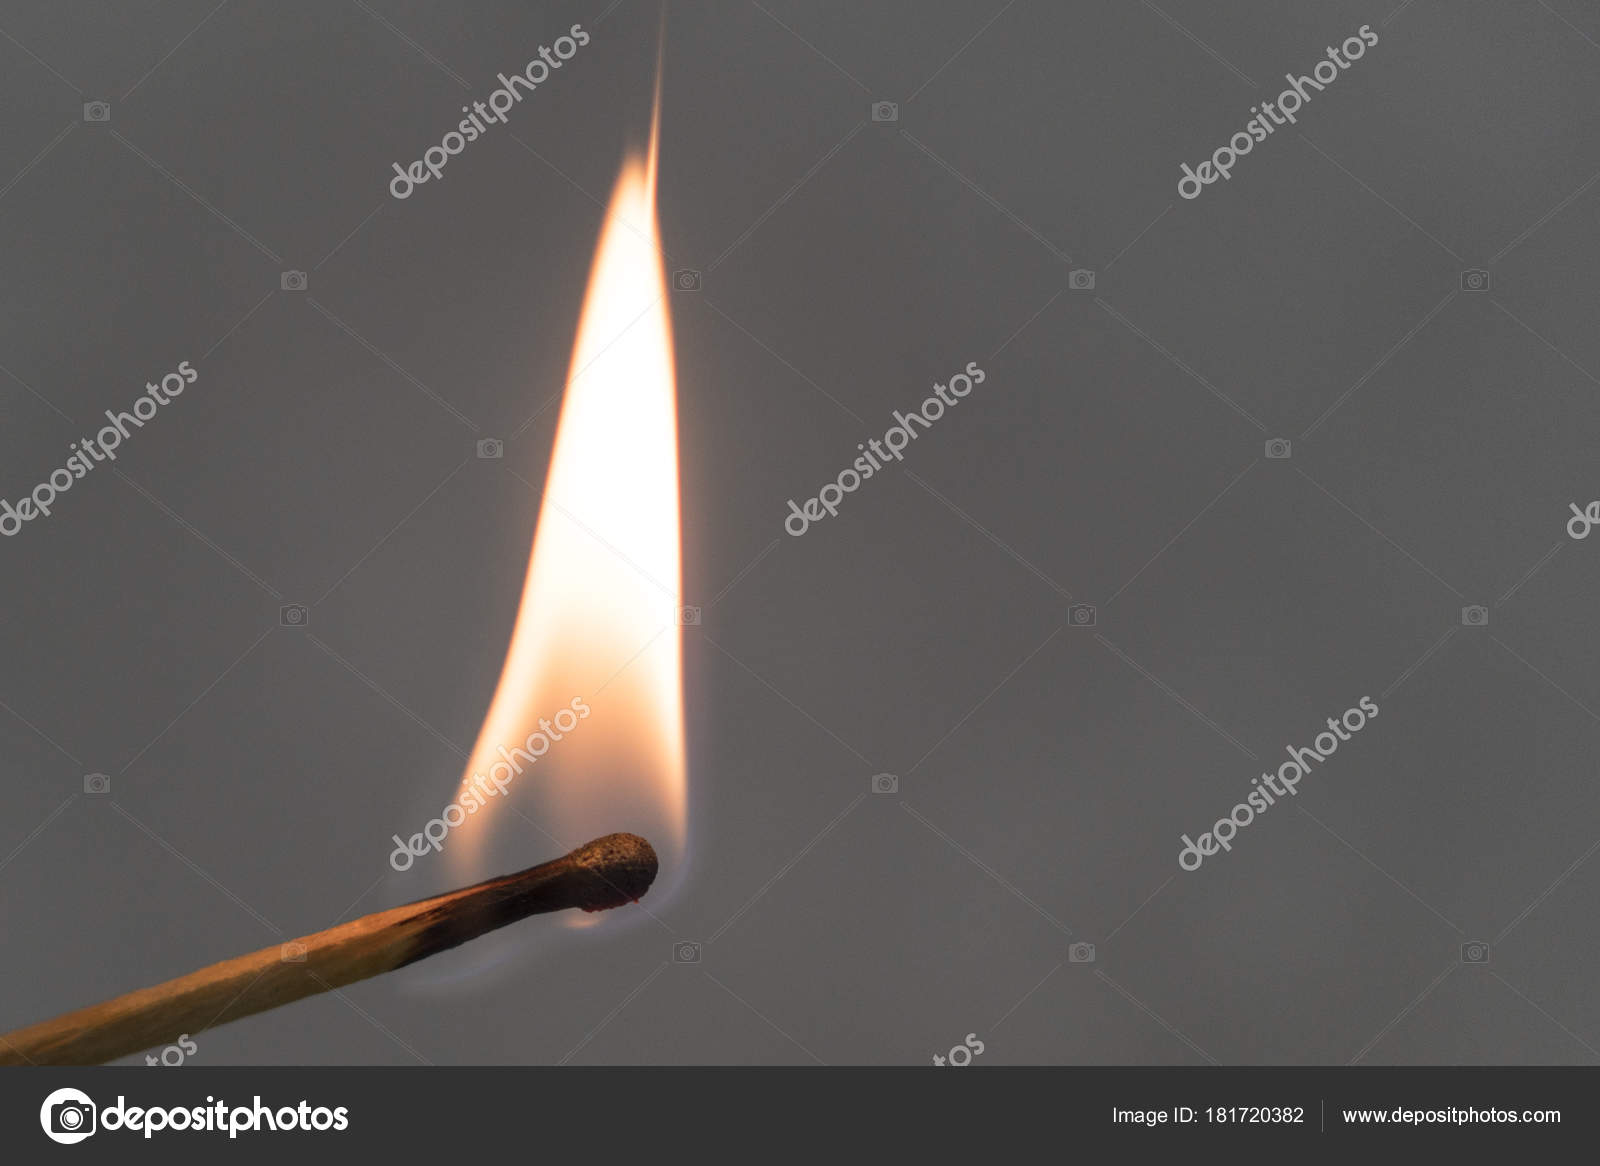 hand burning match stick